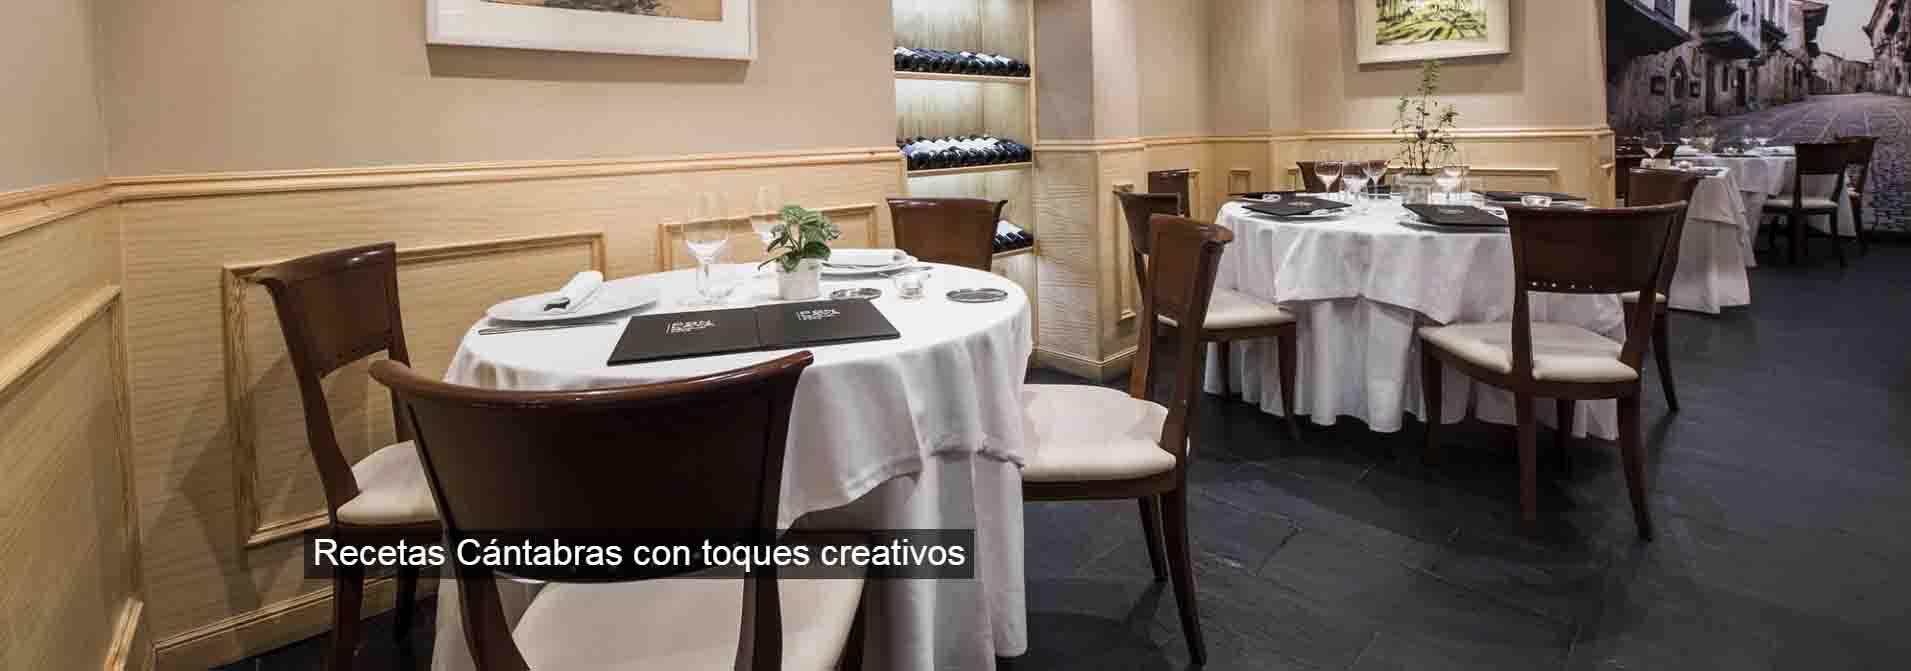 restaurante conyala madrid